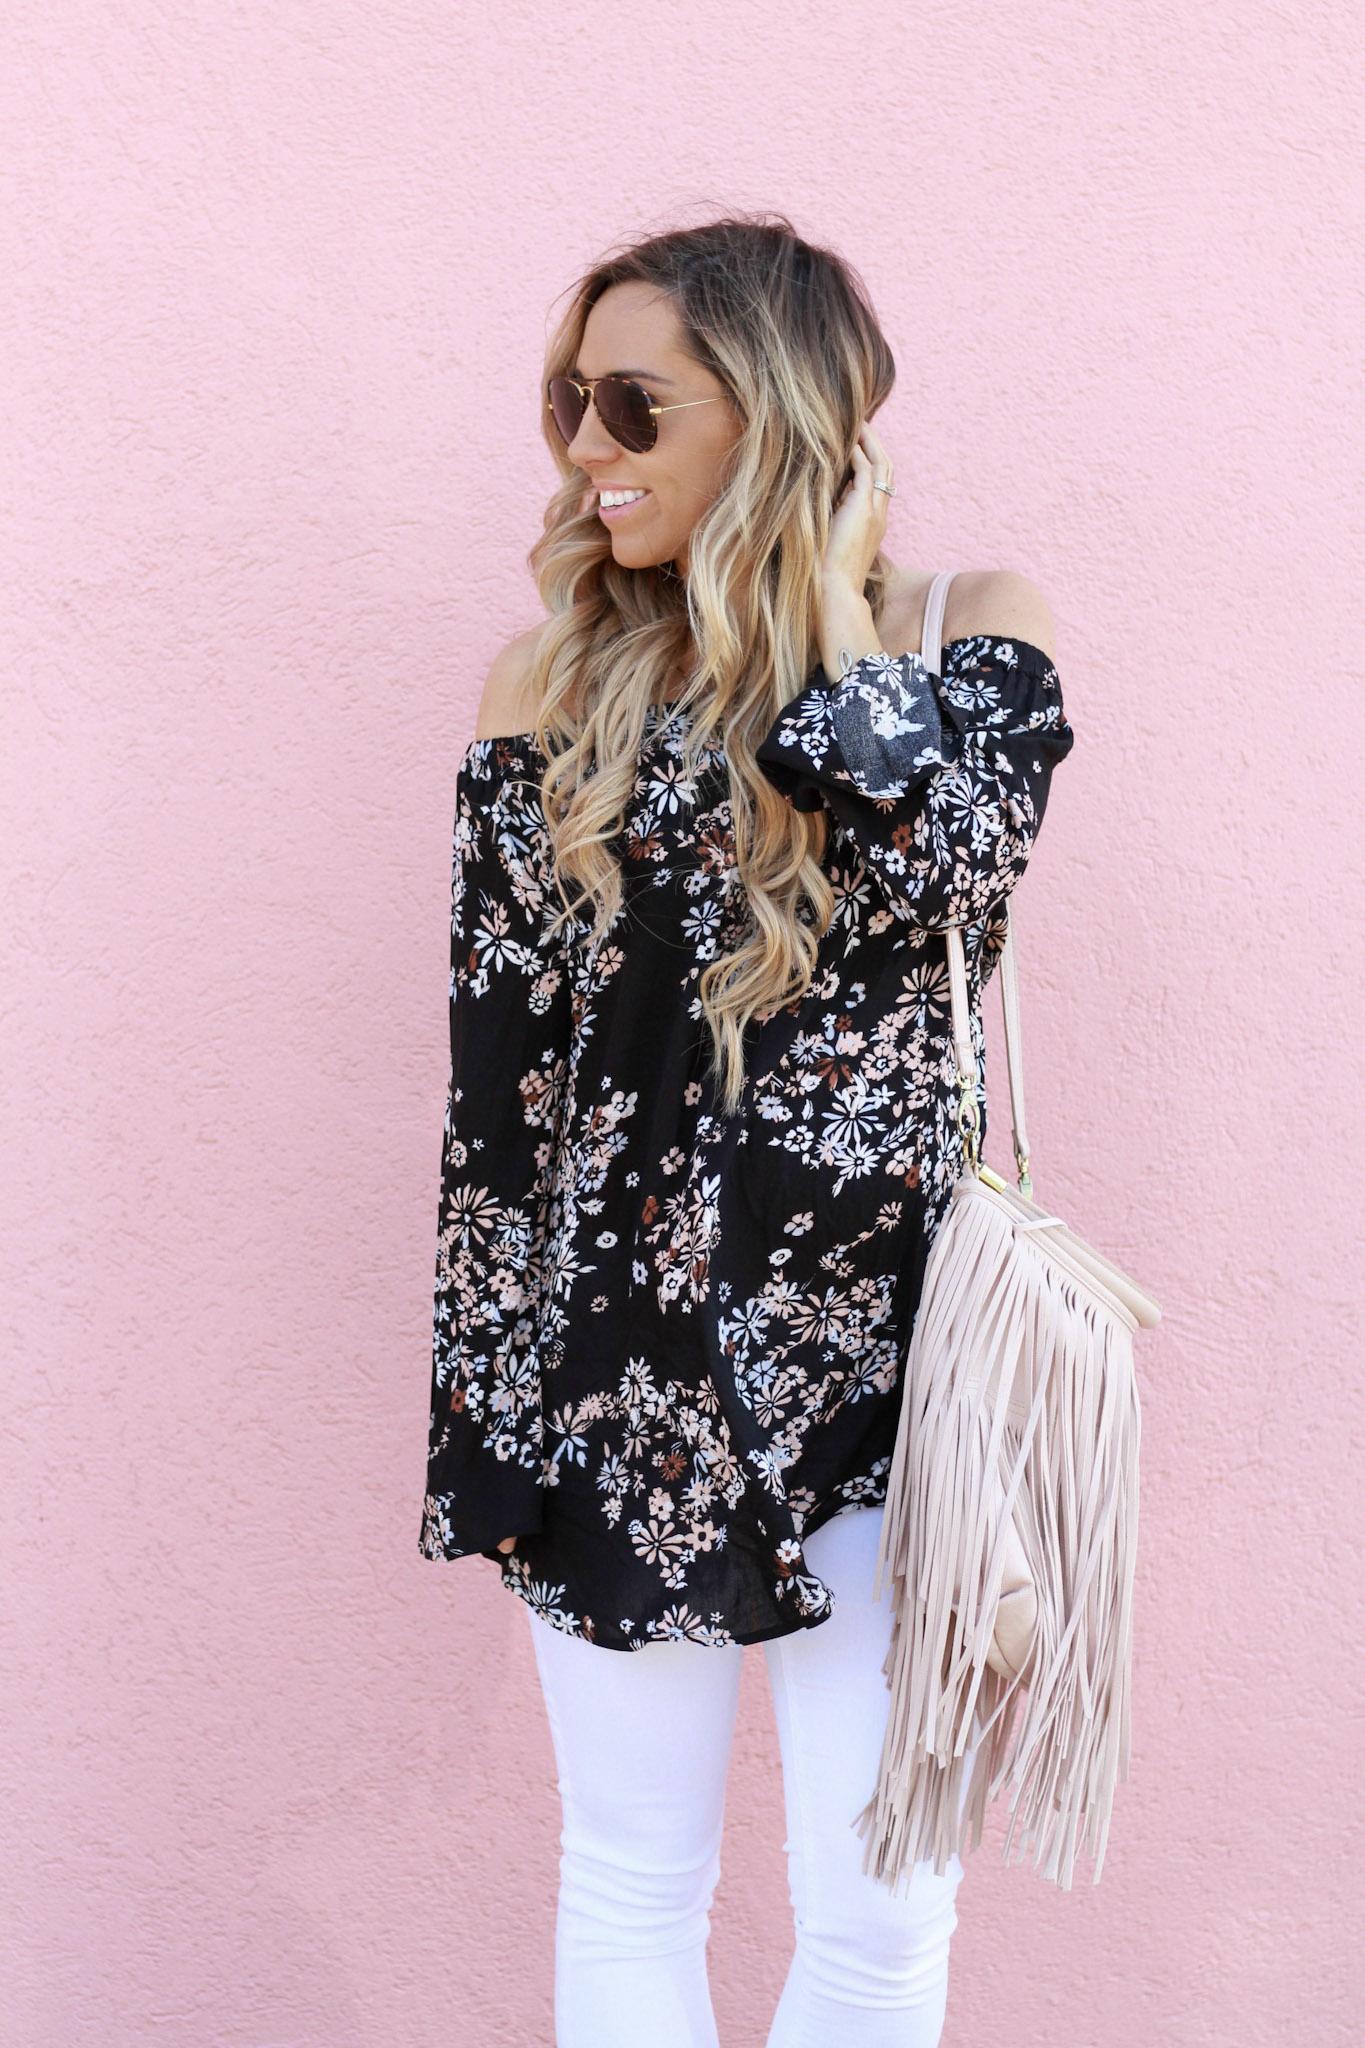 accordingtoblaire, according to blaire, floral ots top, nordstrom, fashion blogger, rva blogger, fringe bag, white skinny jeans, maternity jeans, top fashion bloggers